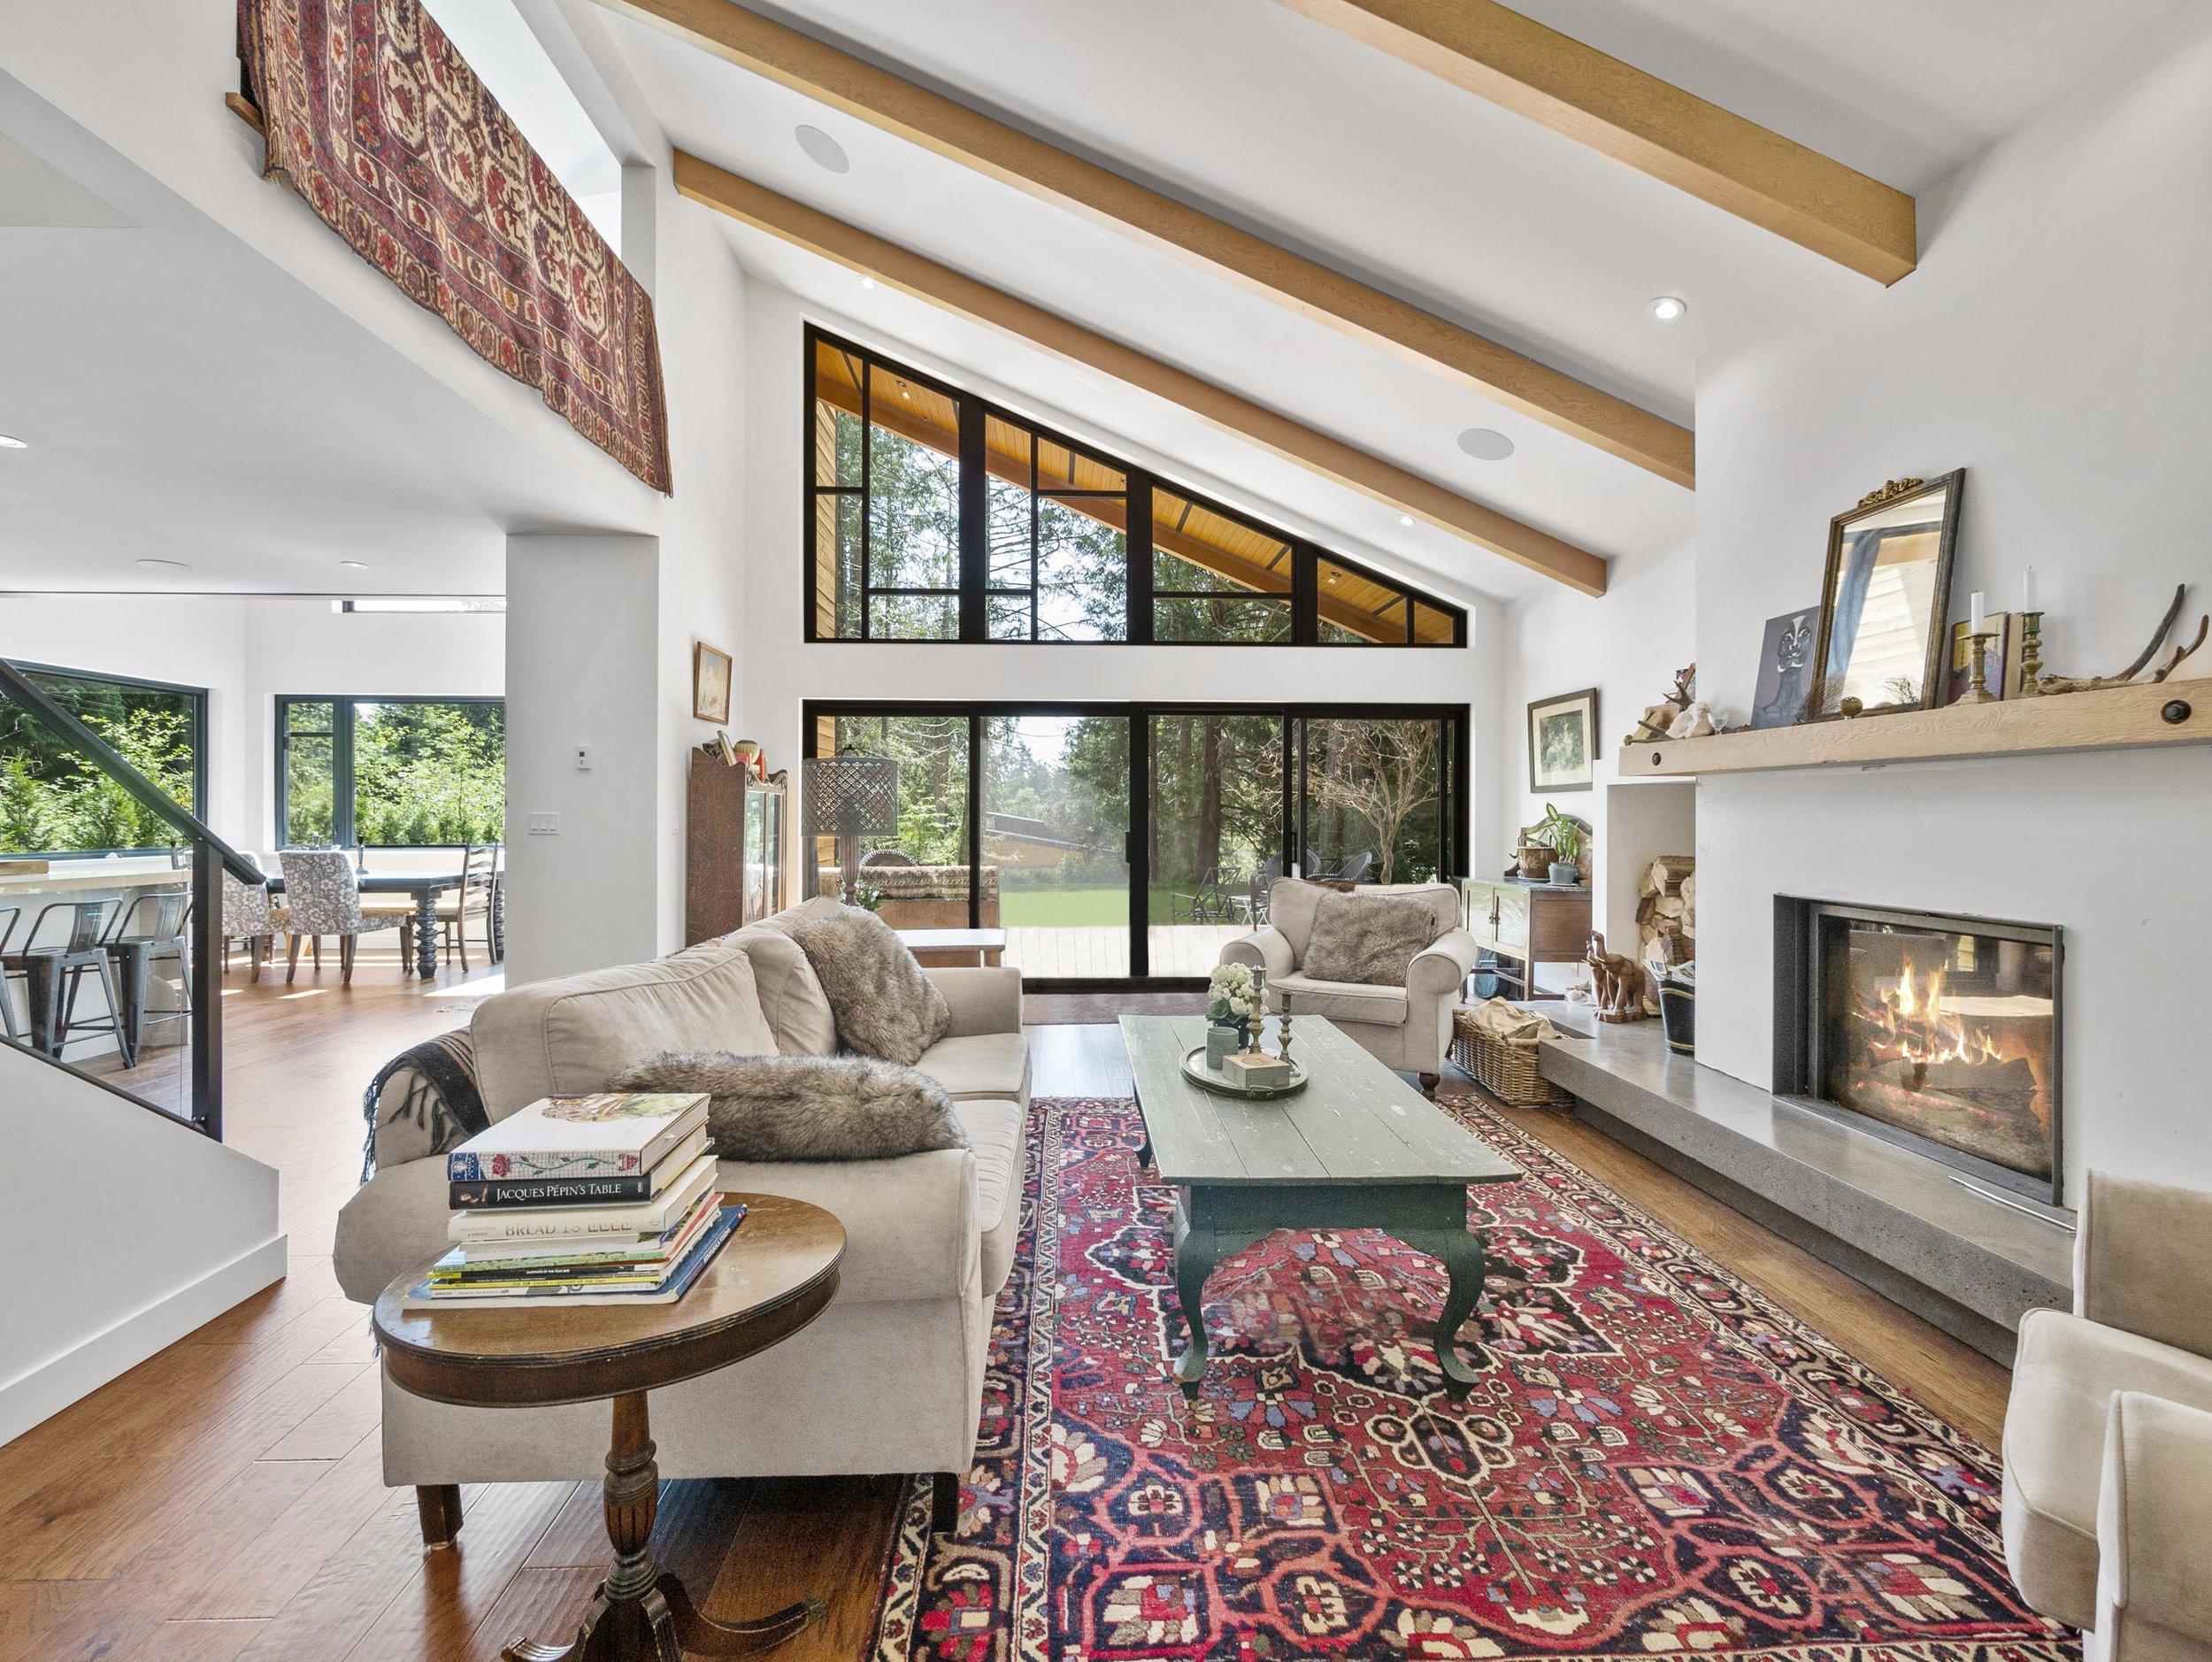 p24 living room and large windows, no bike_MJ.jpg